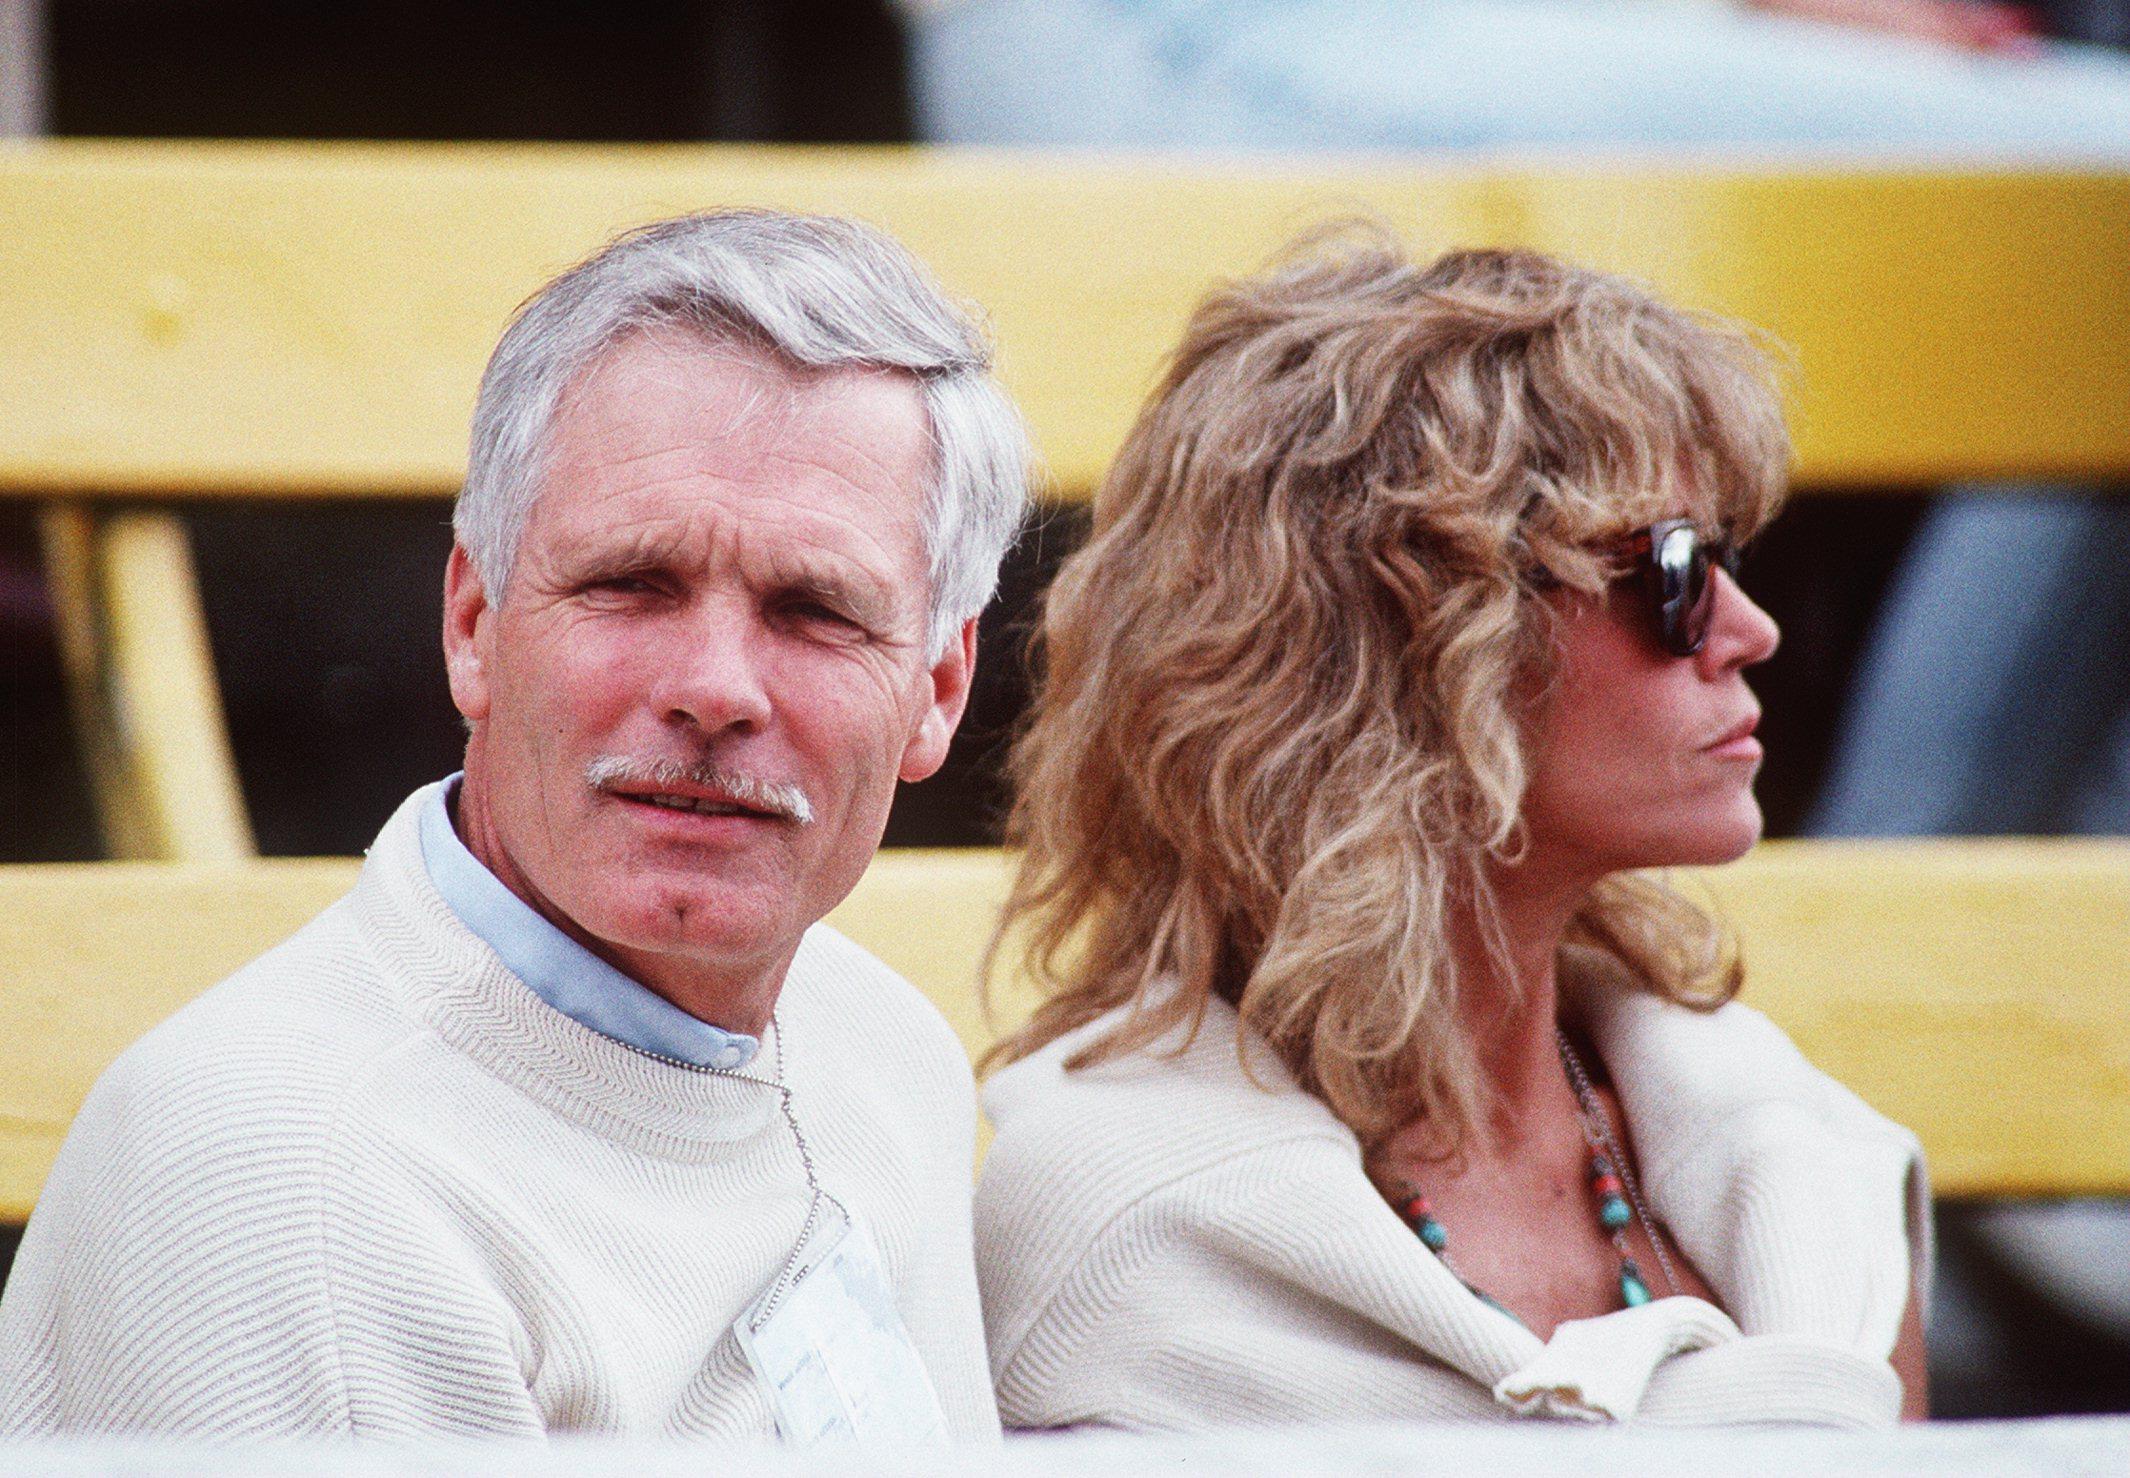 24 JUL 1990:  MEDIA MAGNATE TED TURNER AND ACTRESS JANE FONDA. Mandatory Credit: Tony Duffy/ALLSPORT